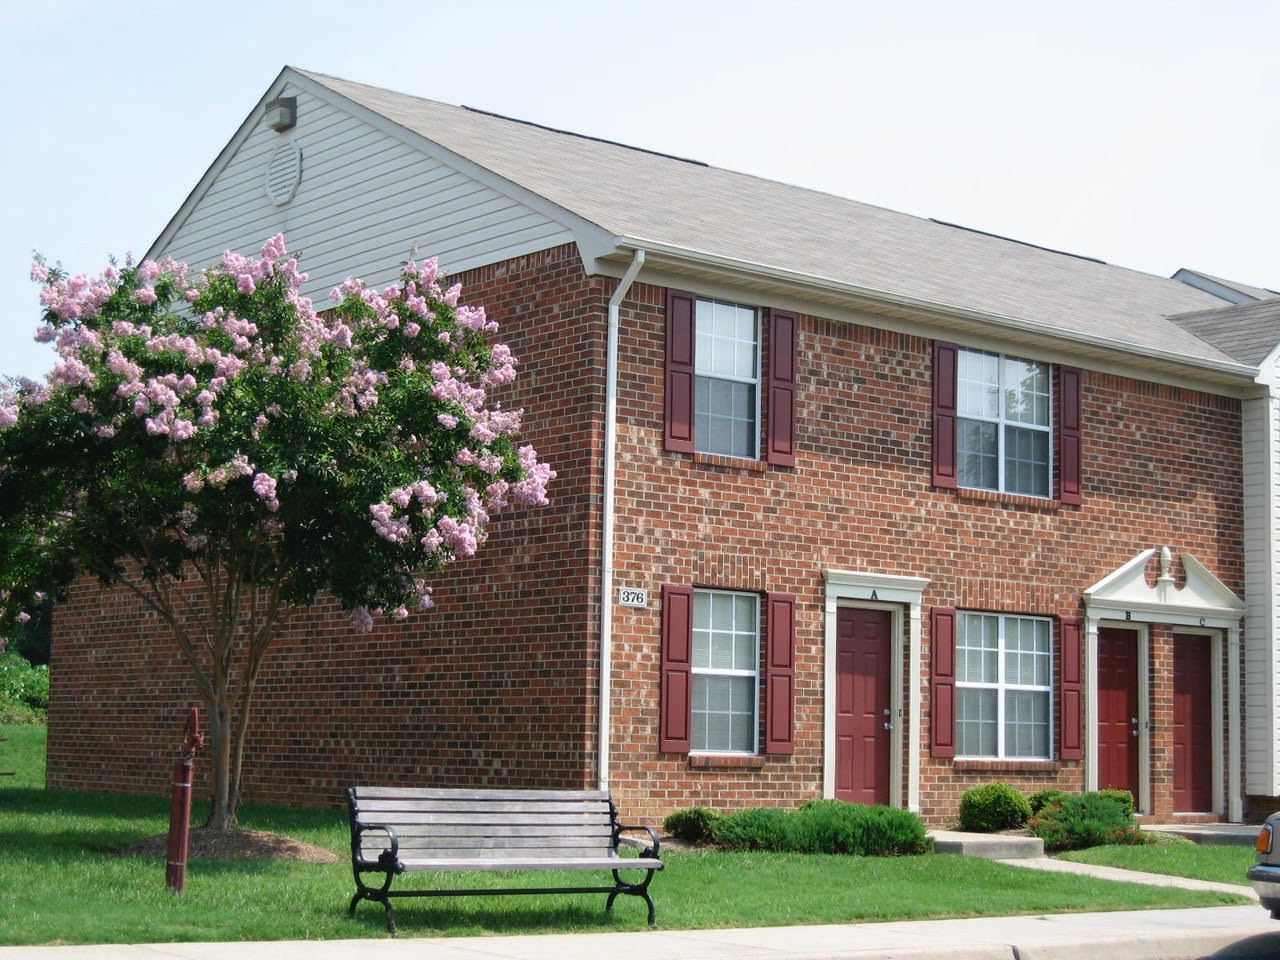 Garden Style Apartments at Meadowridge Apartments in Franklin, VA